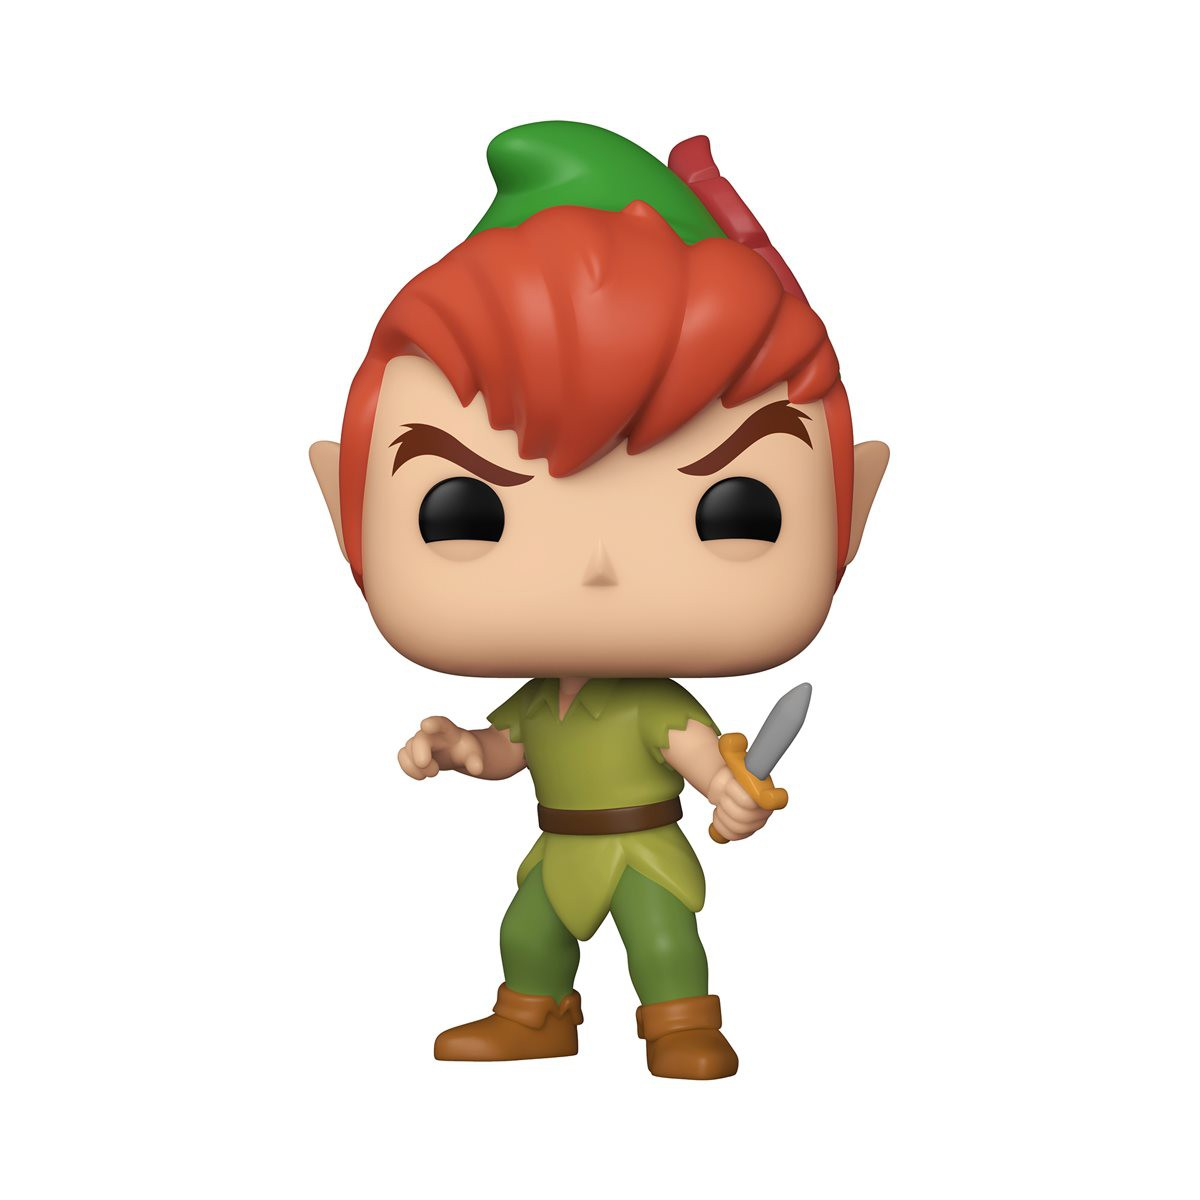 Funko Pop! Peter Pan: Aniversário de 65 anos da Disneylândia #815 - Funko